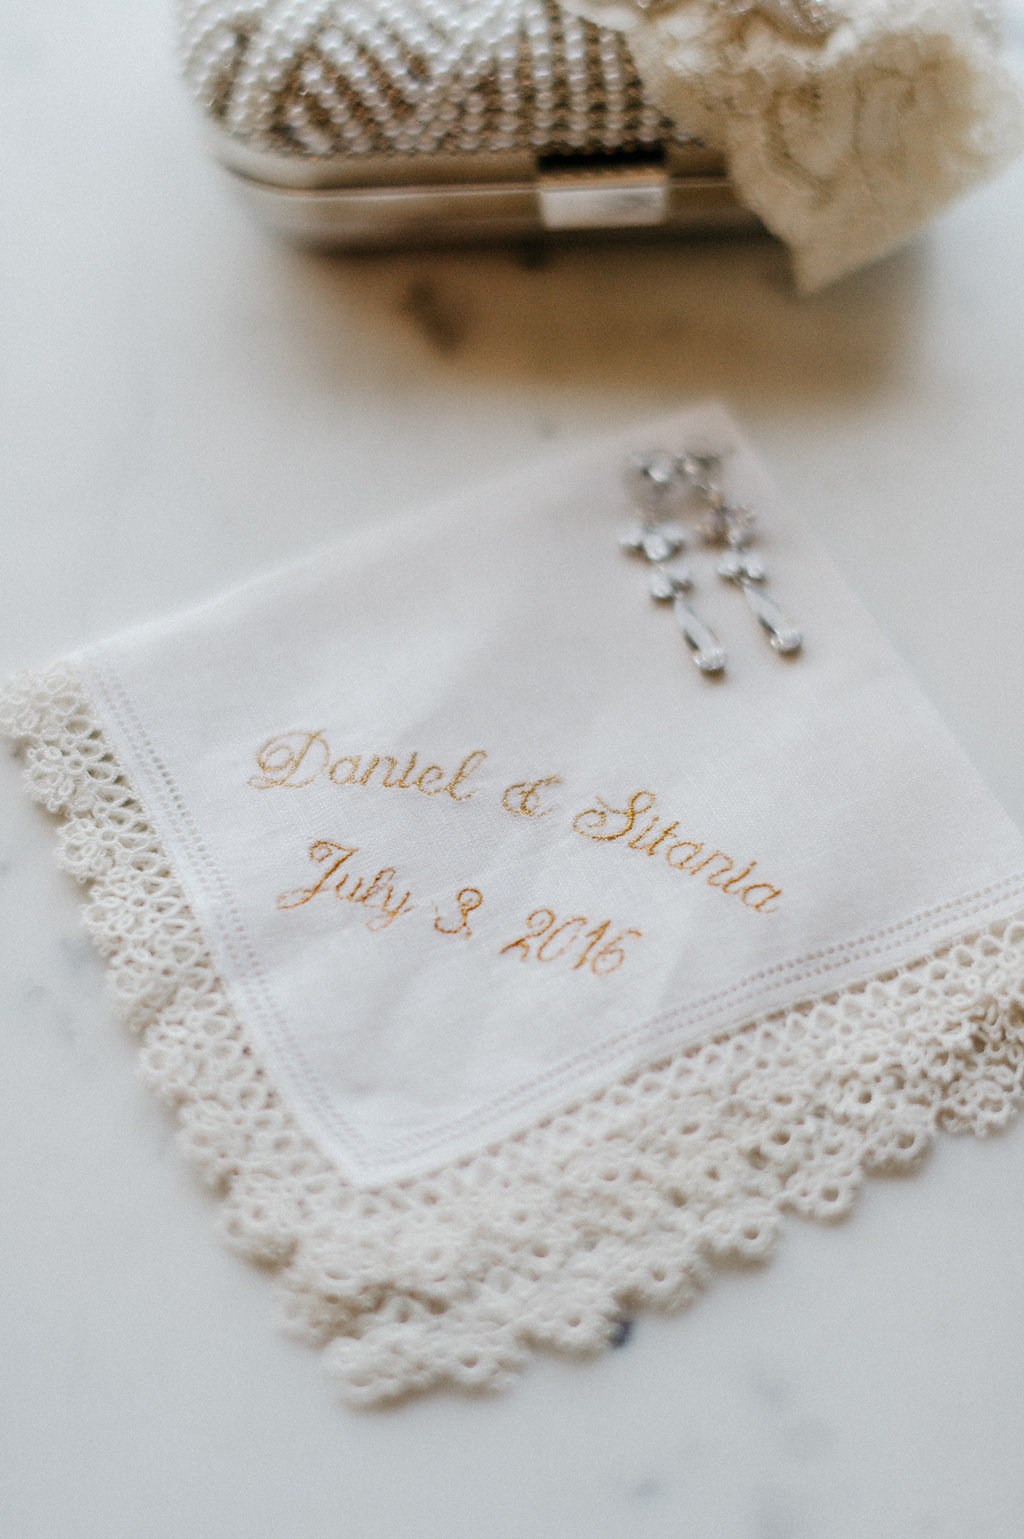 engle-olson-gene-pease-st-paul-wedding-83.jpg